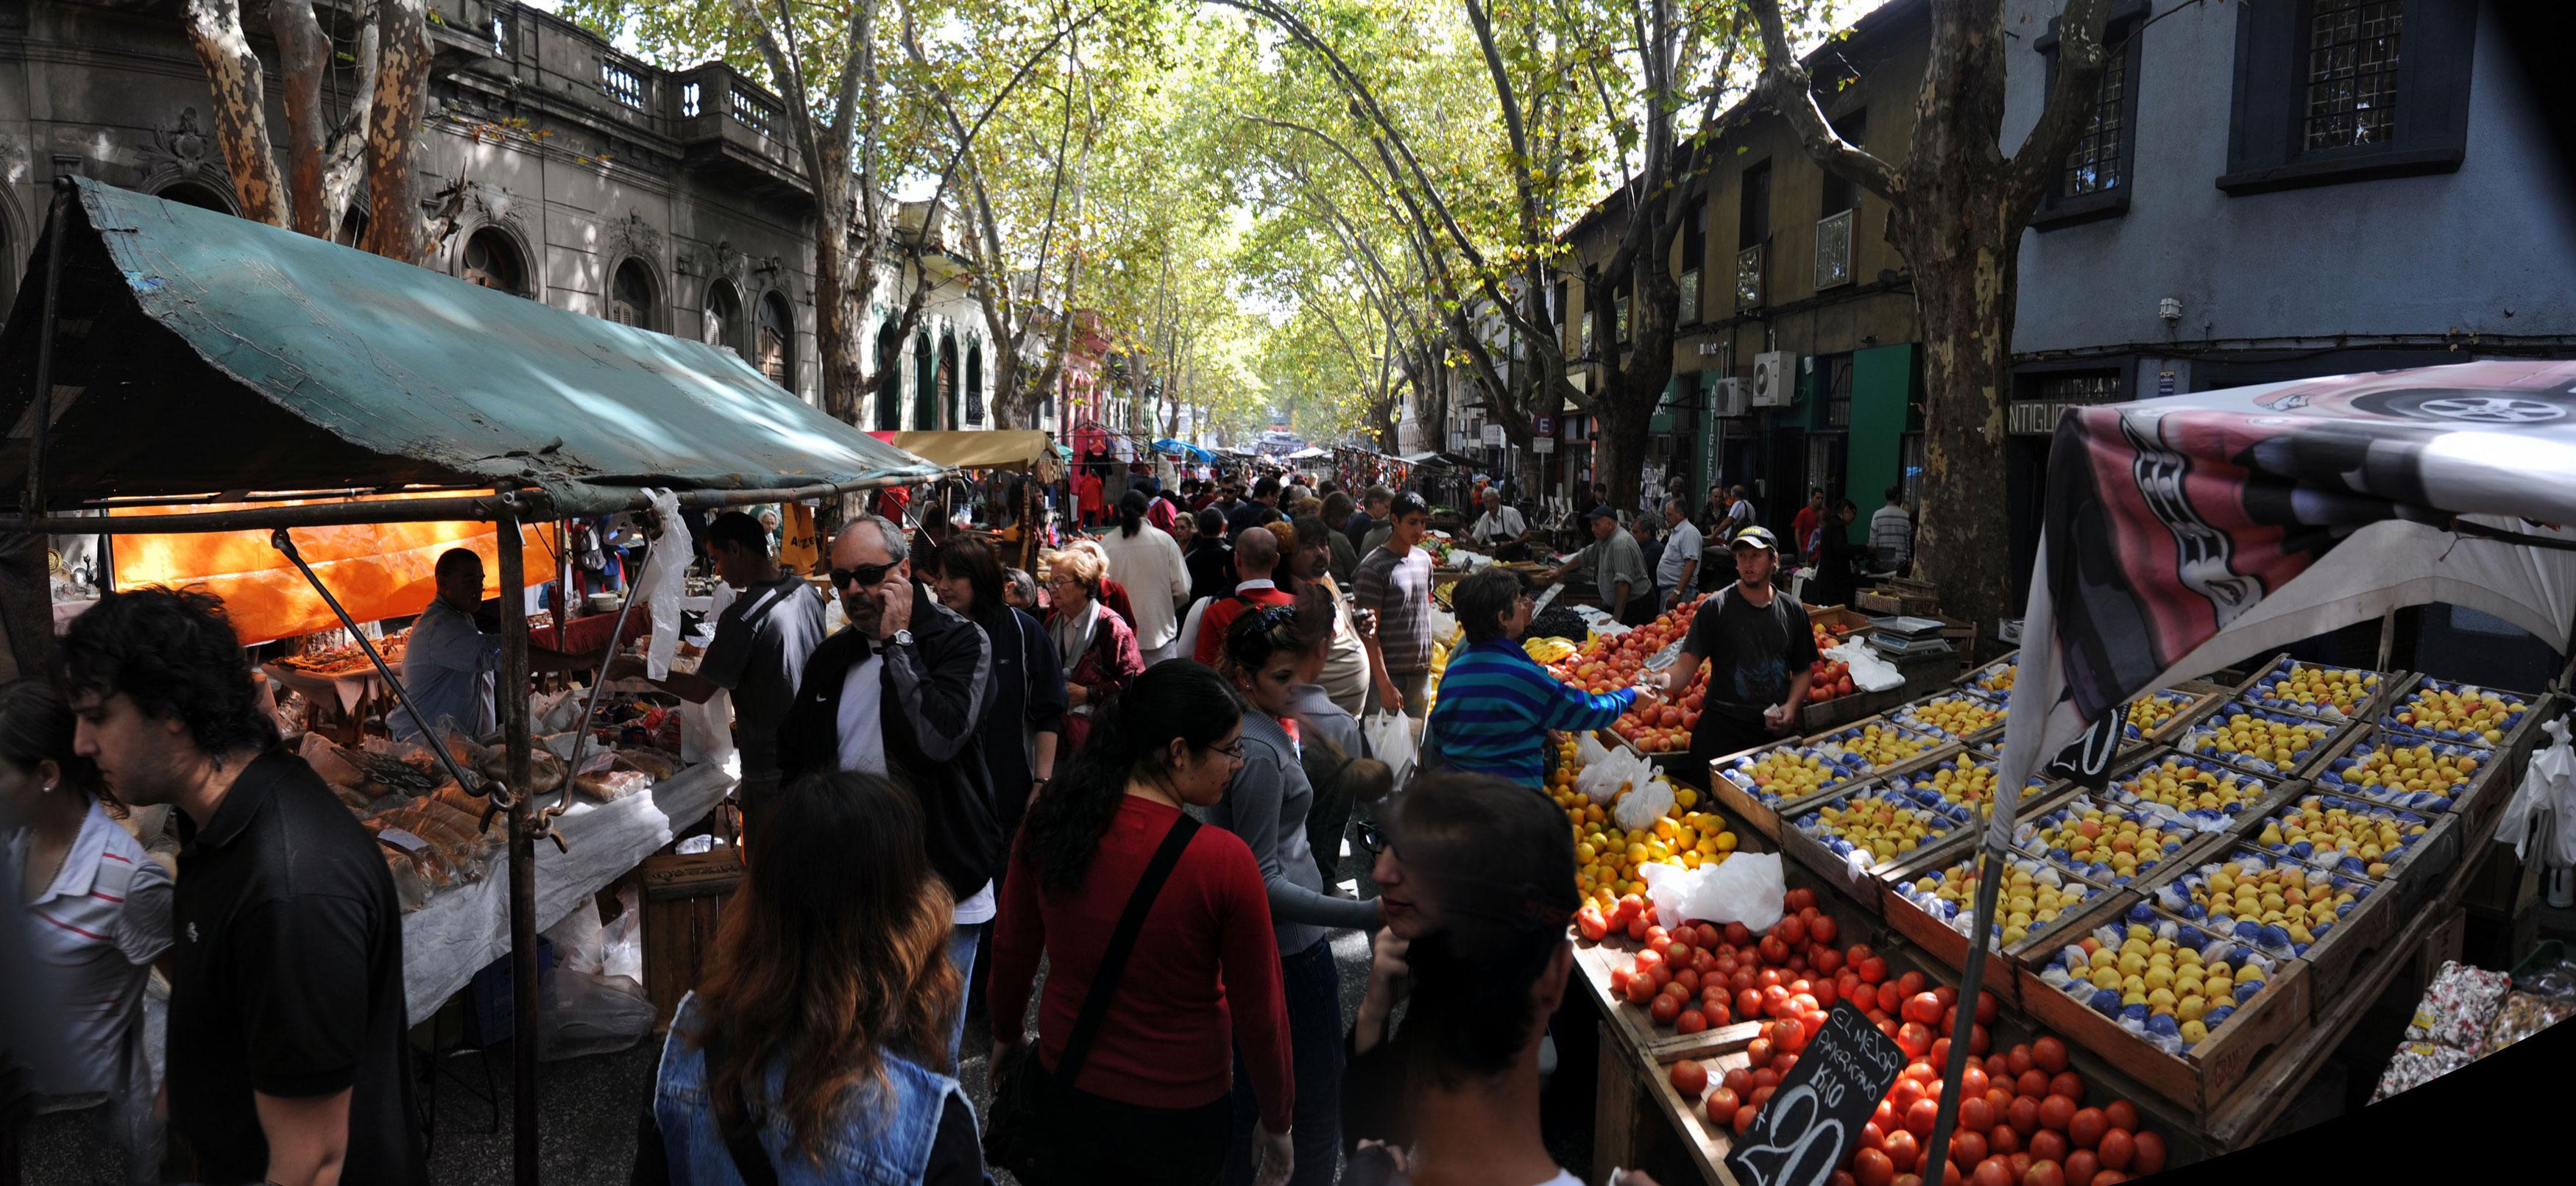 Mont-weekend-street-market-7